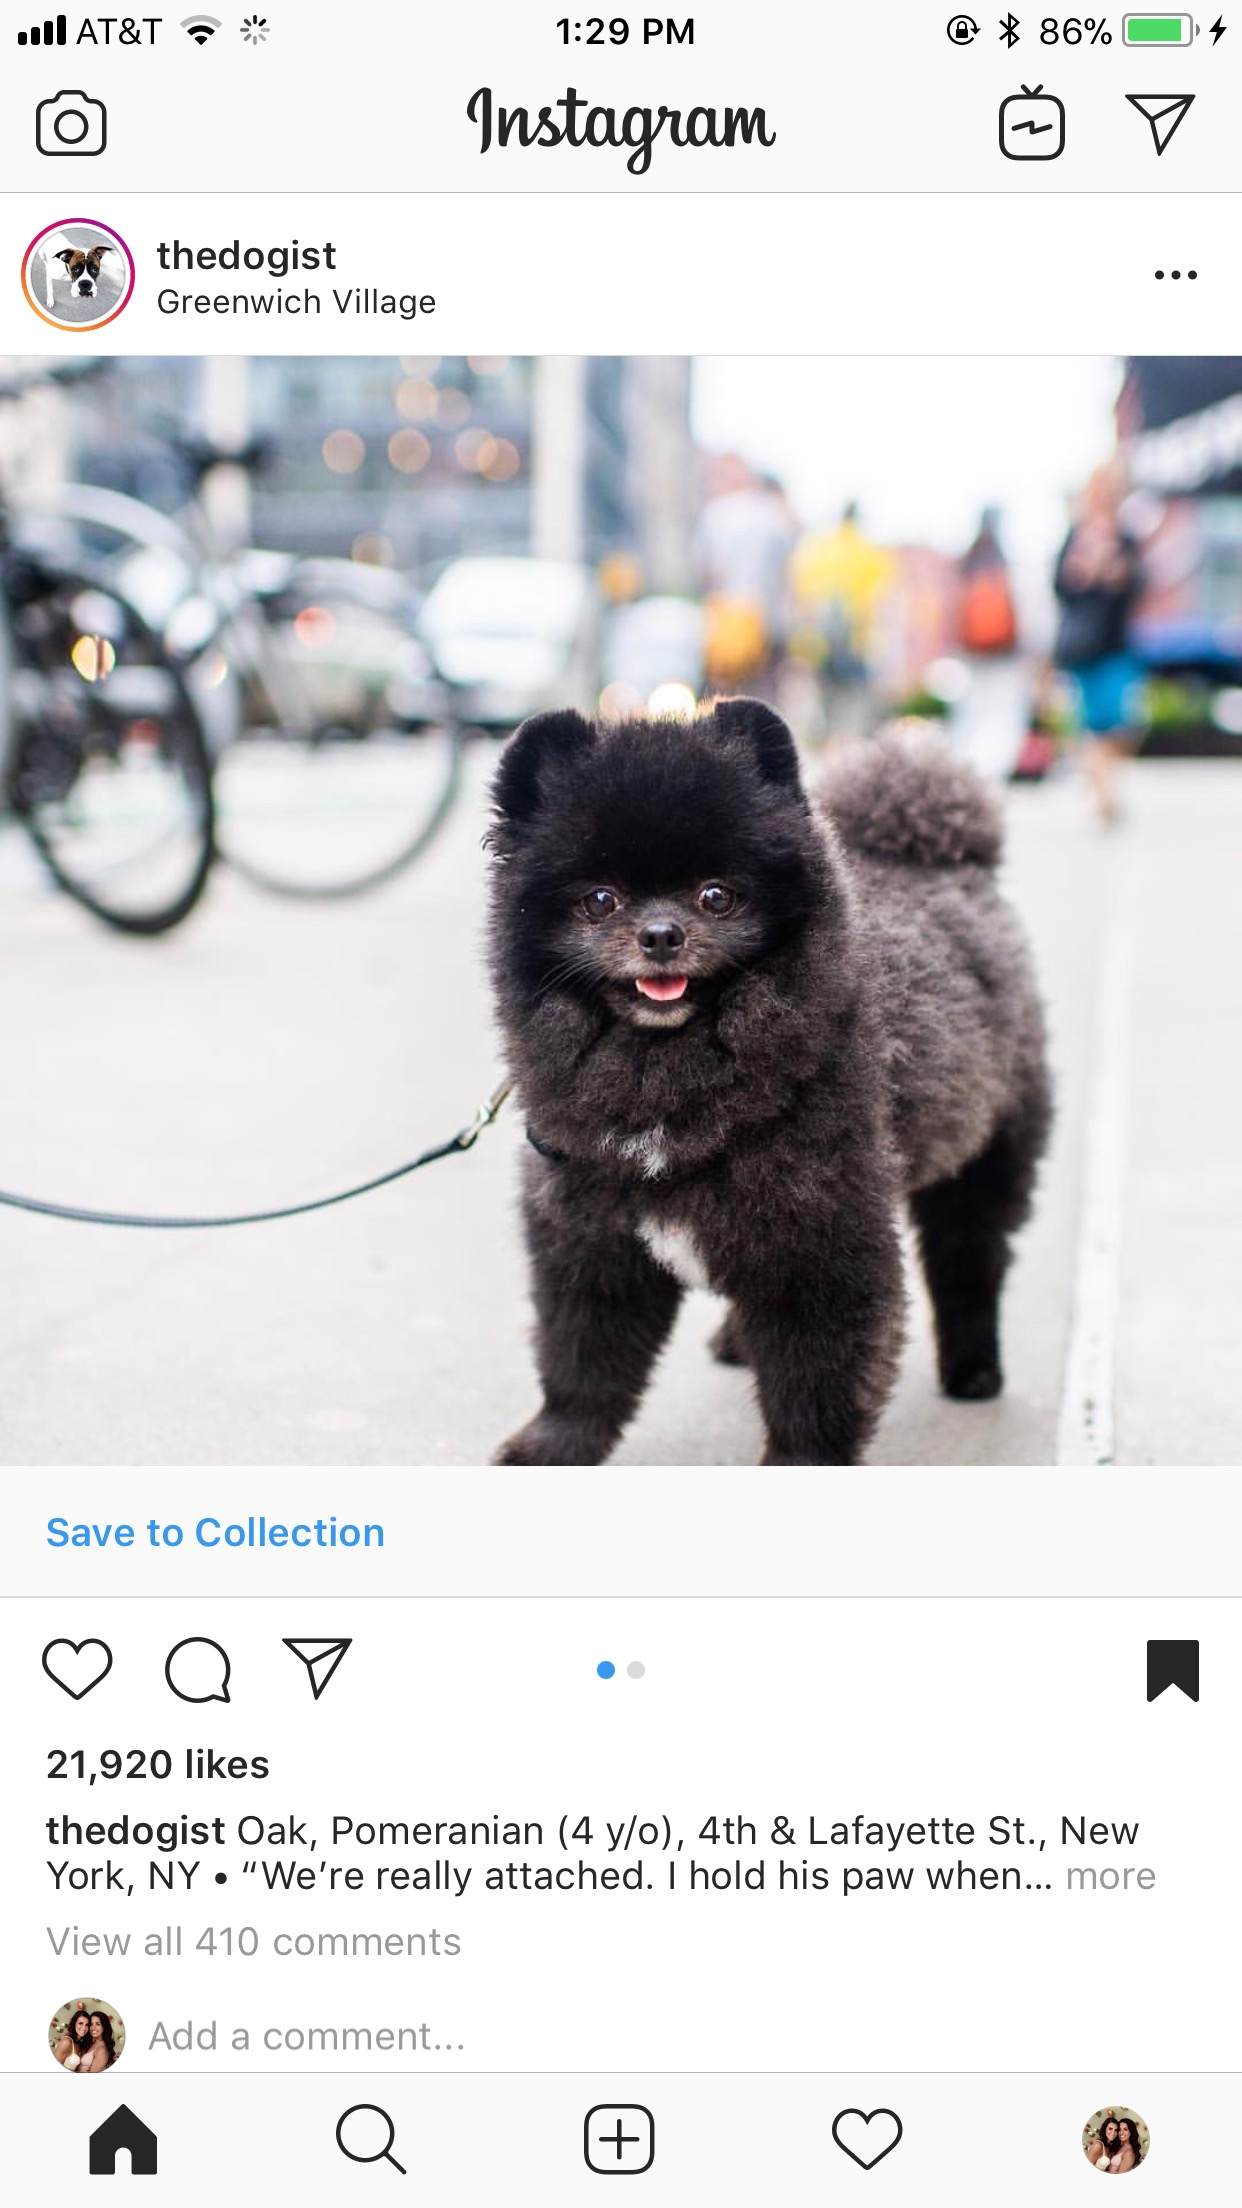 instagram-marketing-41